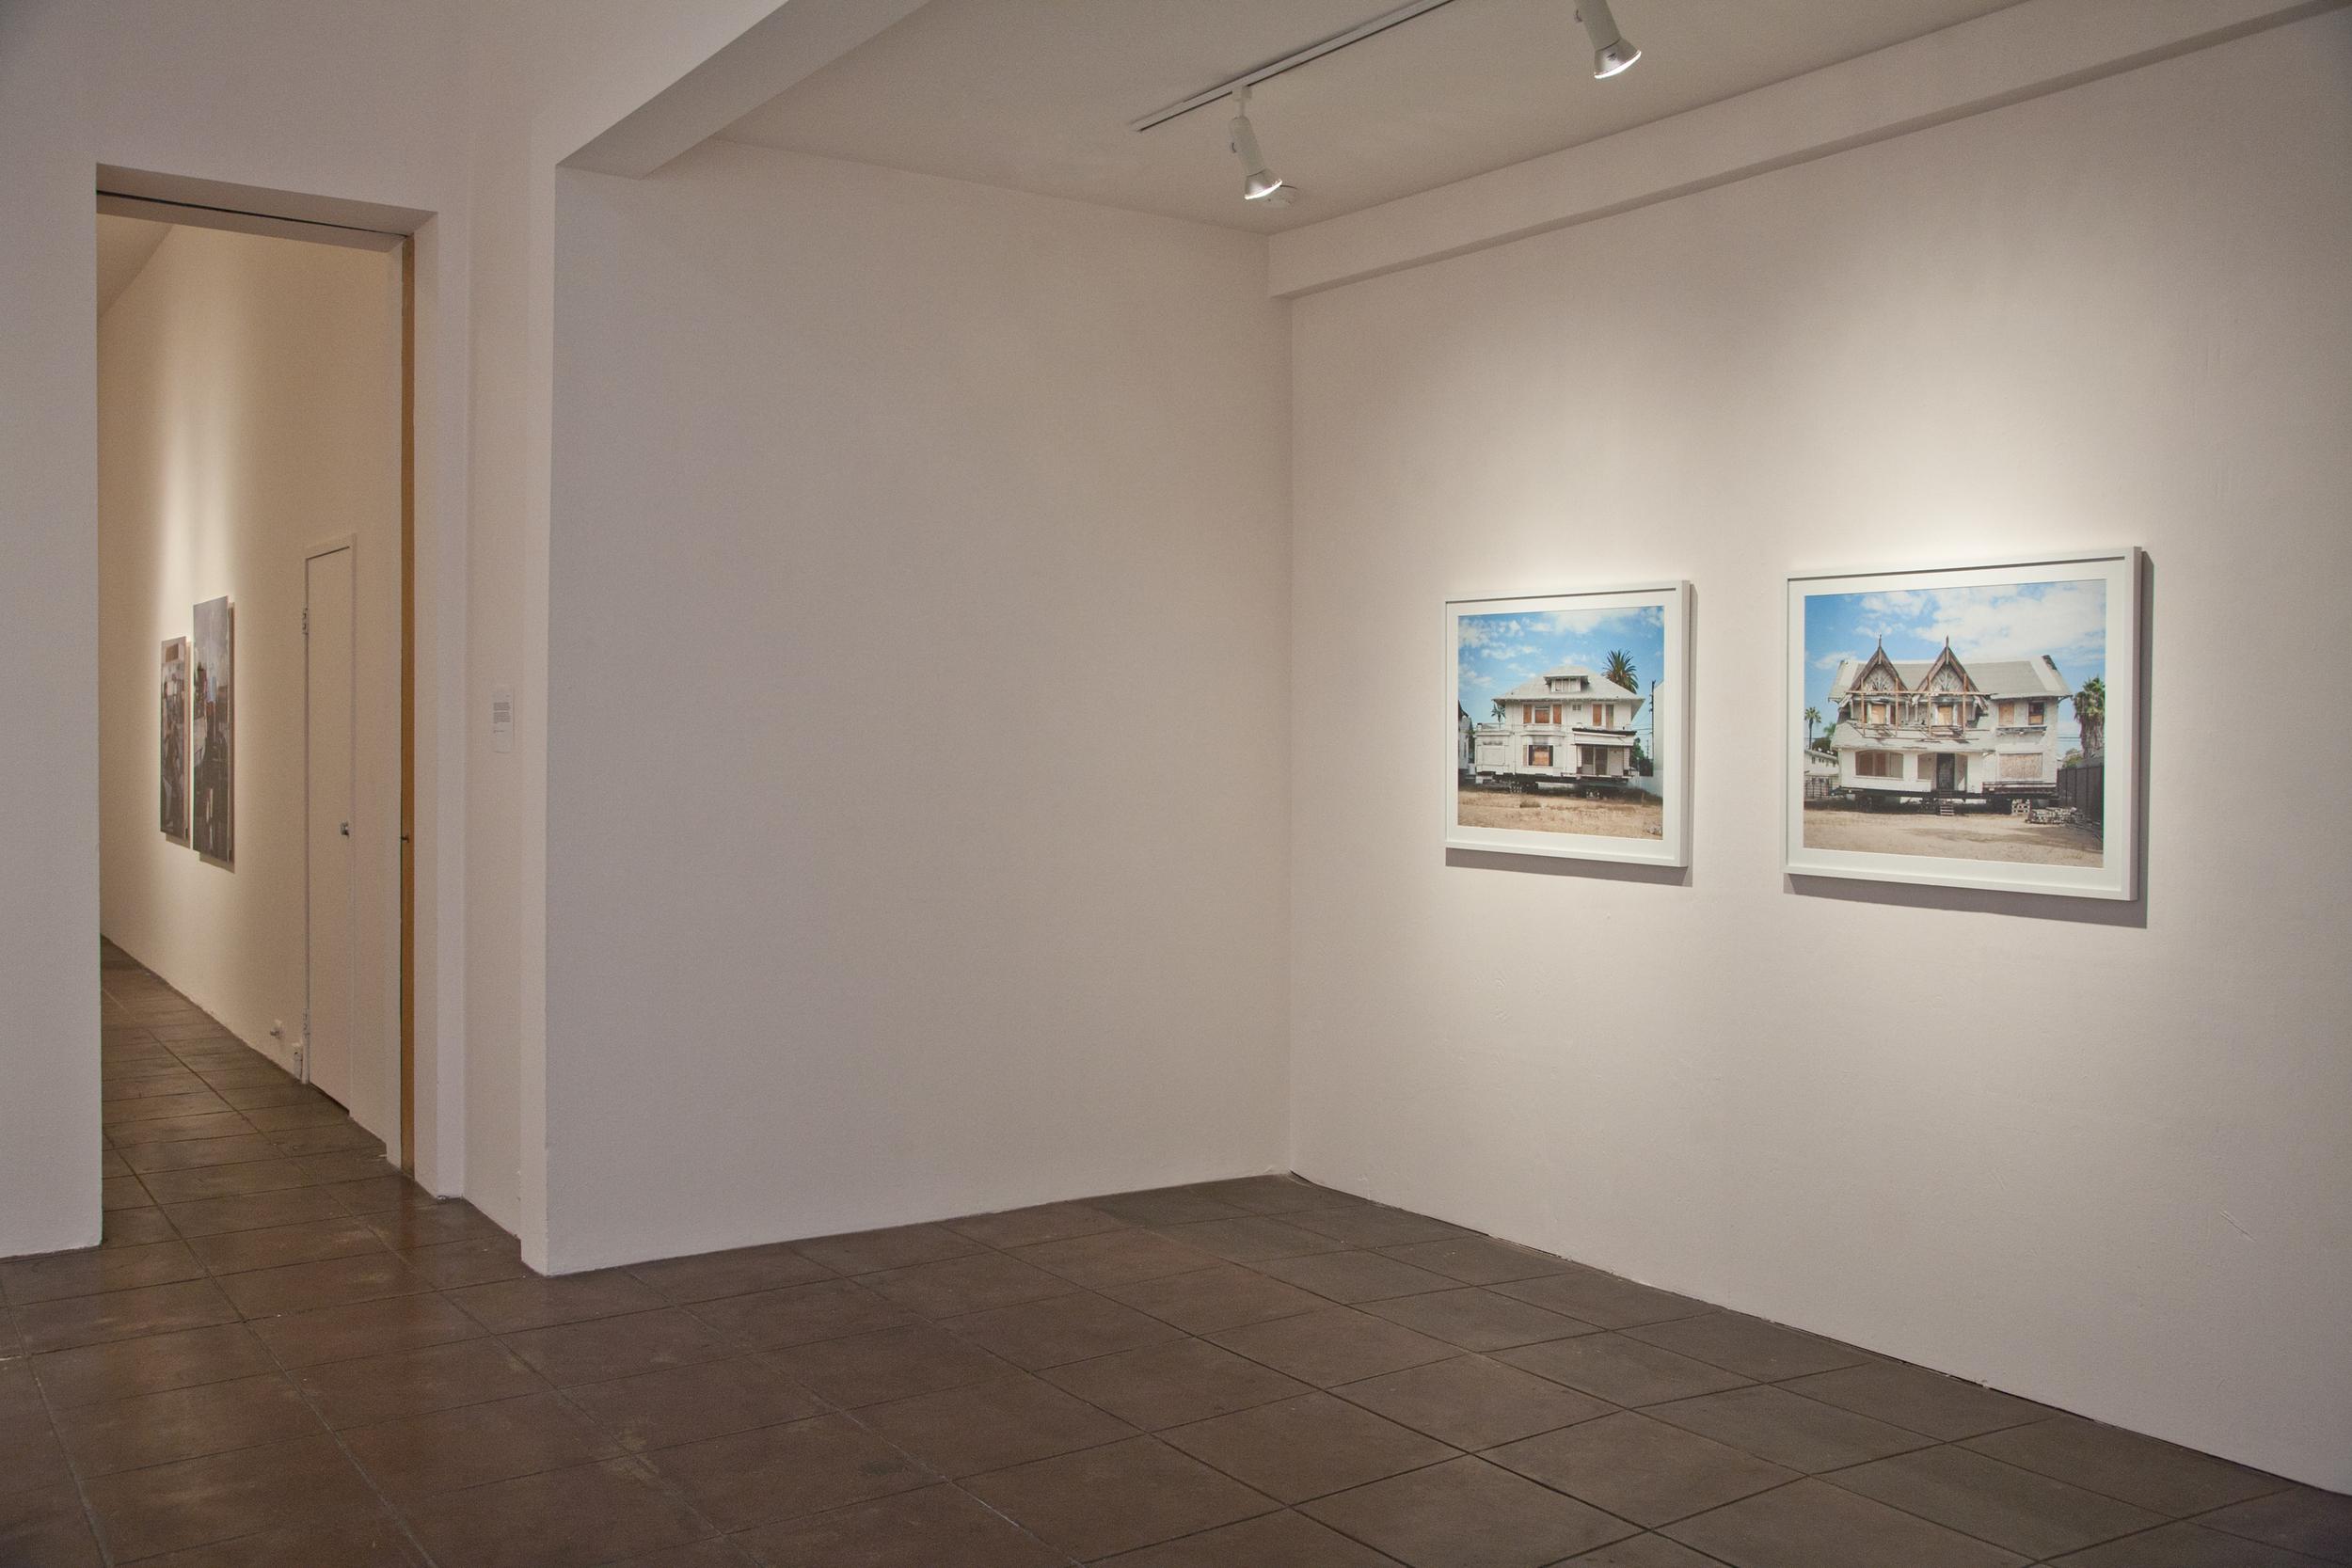 2012, Saudade , gallery installation, Ann 330 Gallery, Los Angeles, CA